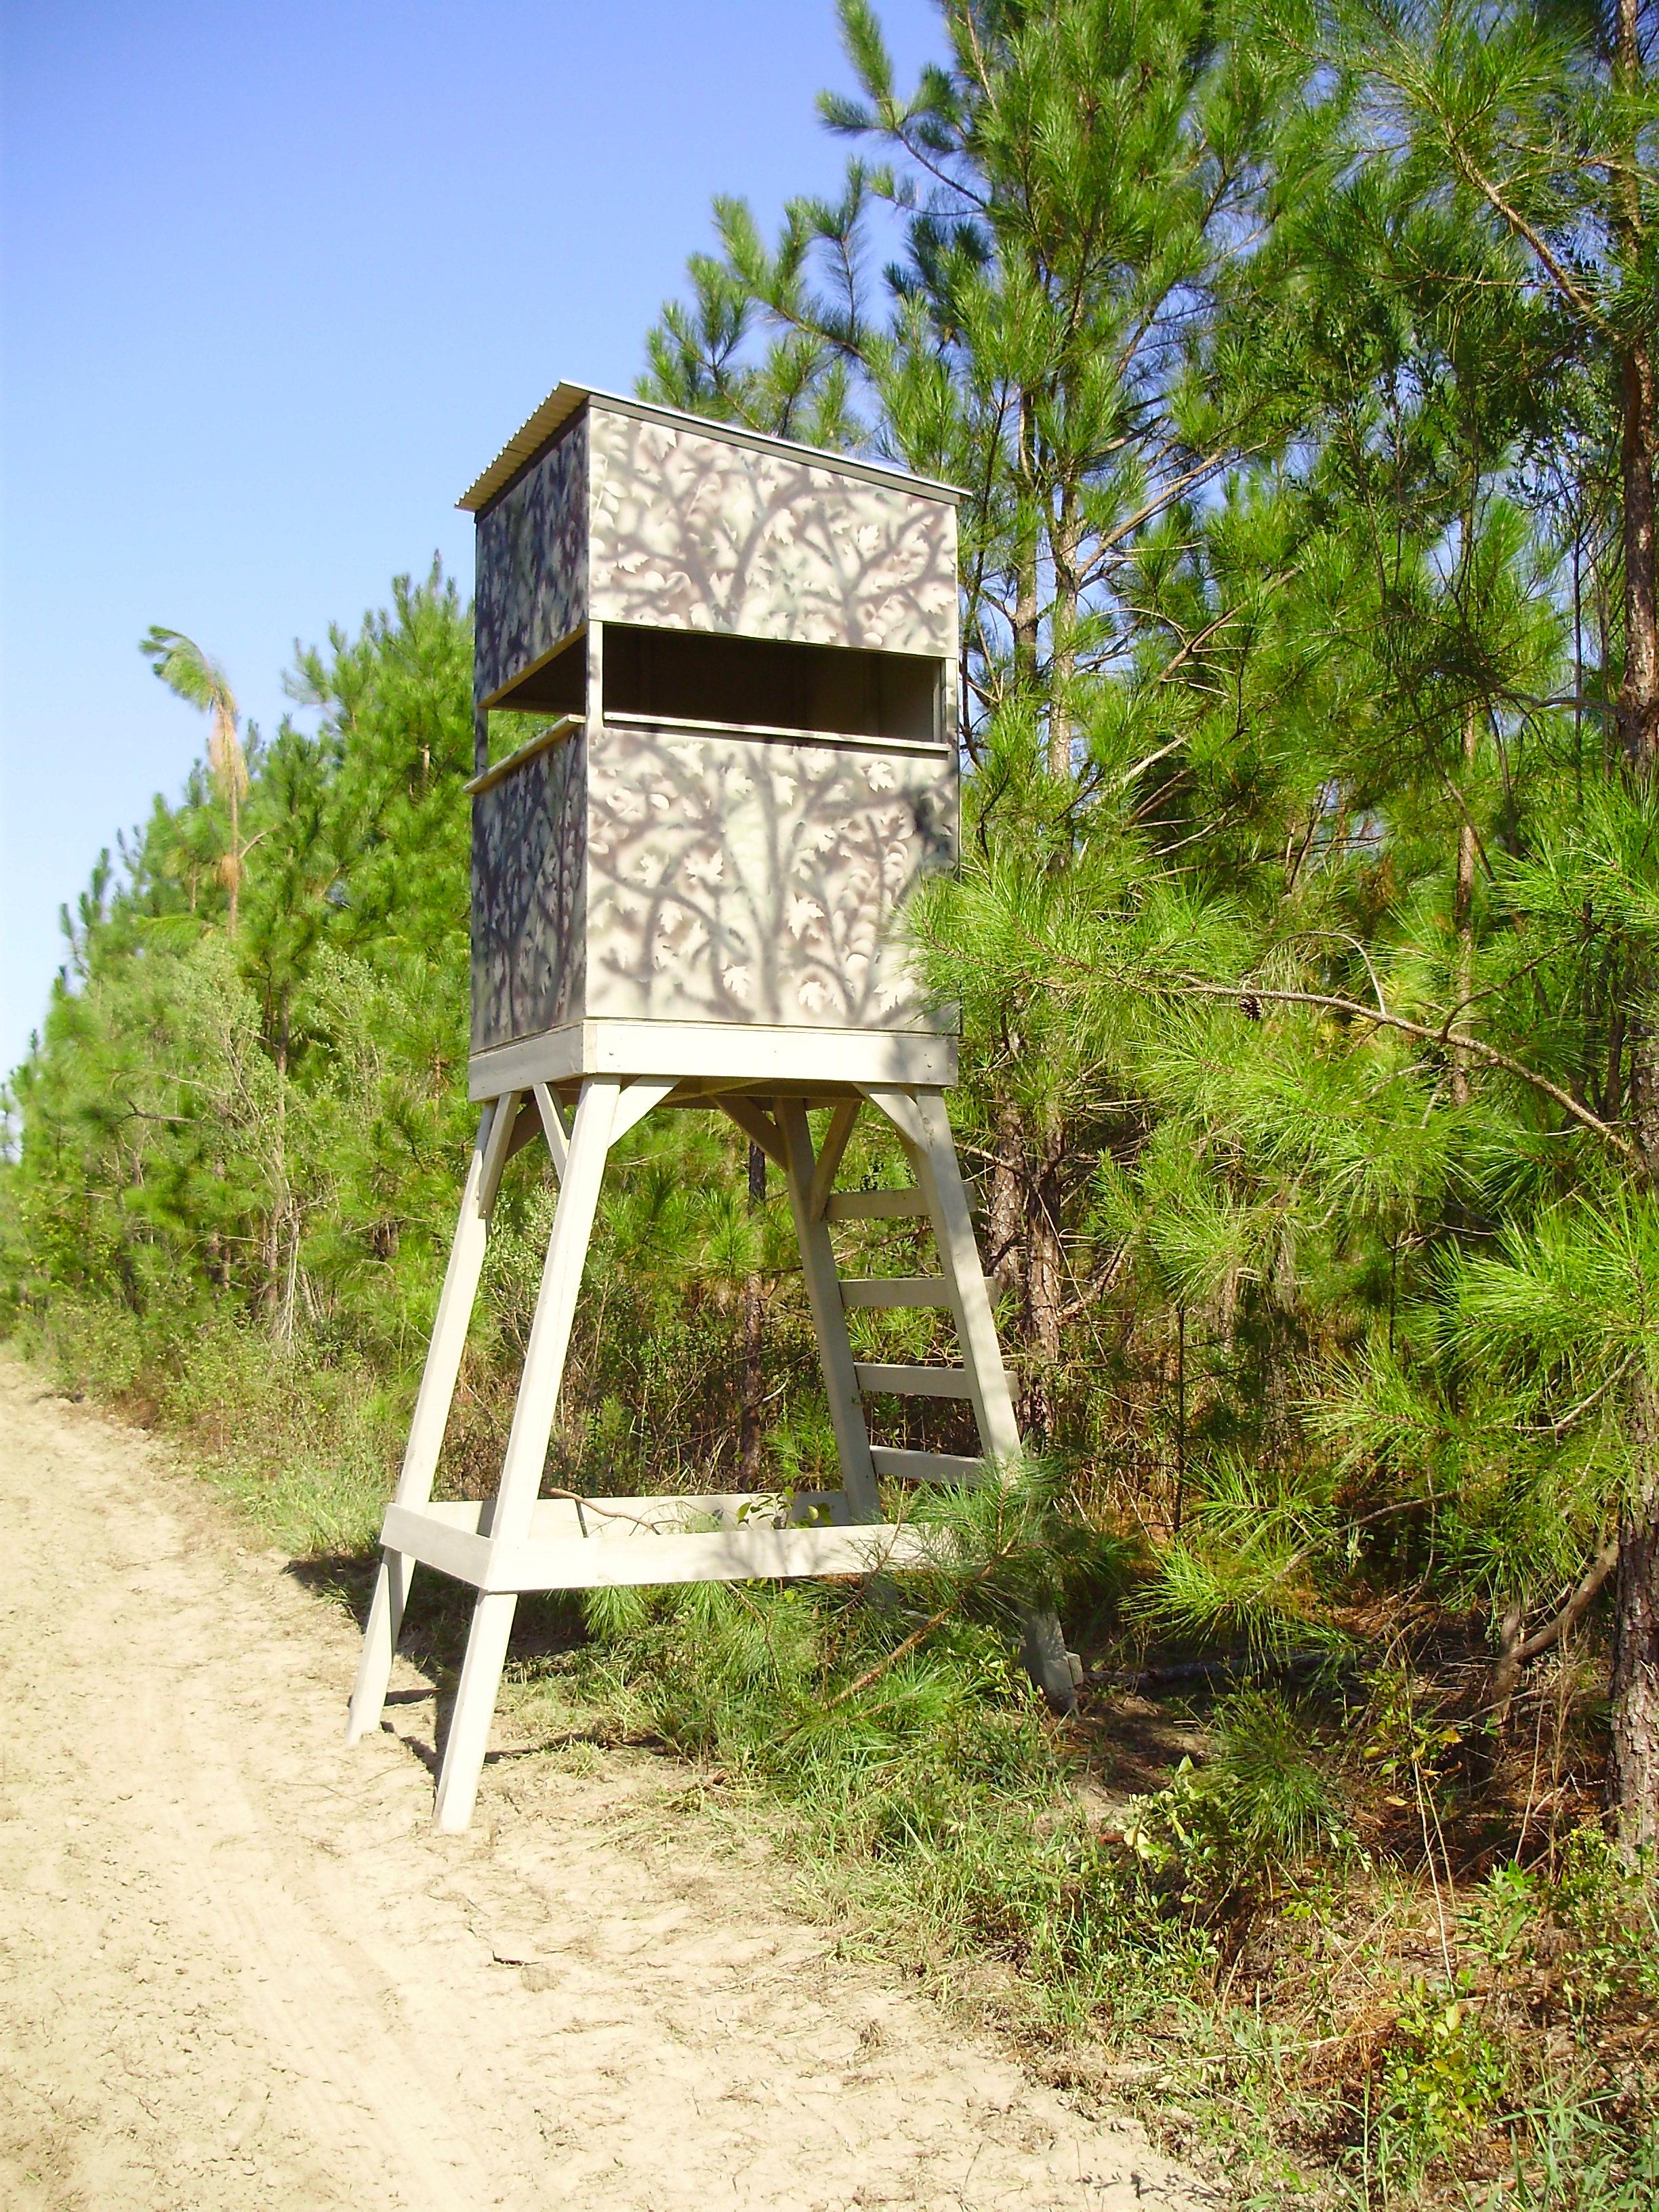 Diy tree stand plans - Cabinet Making Machinery Hardwood Lumber Wholesale